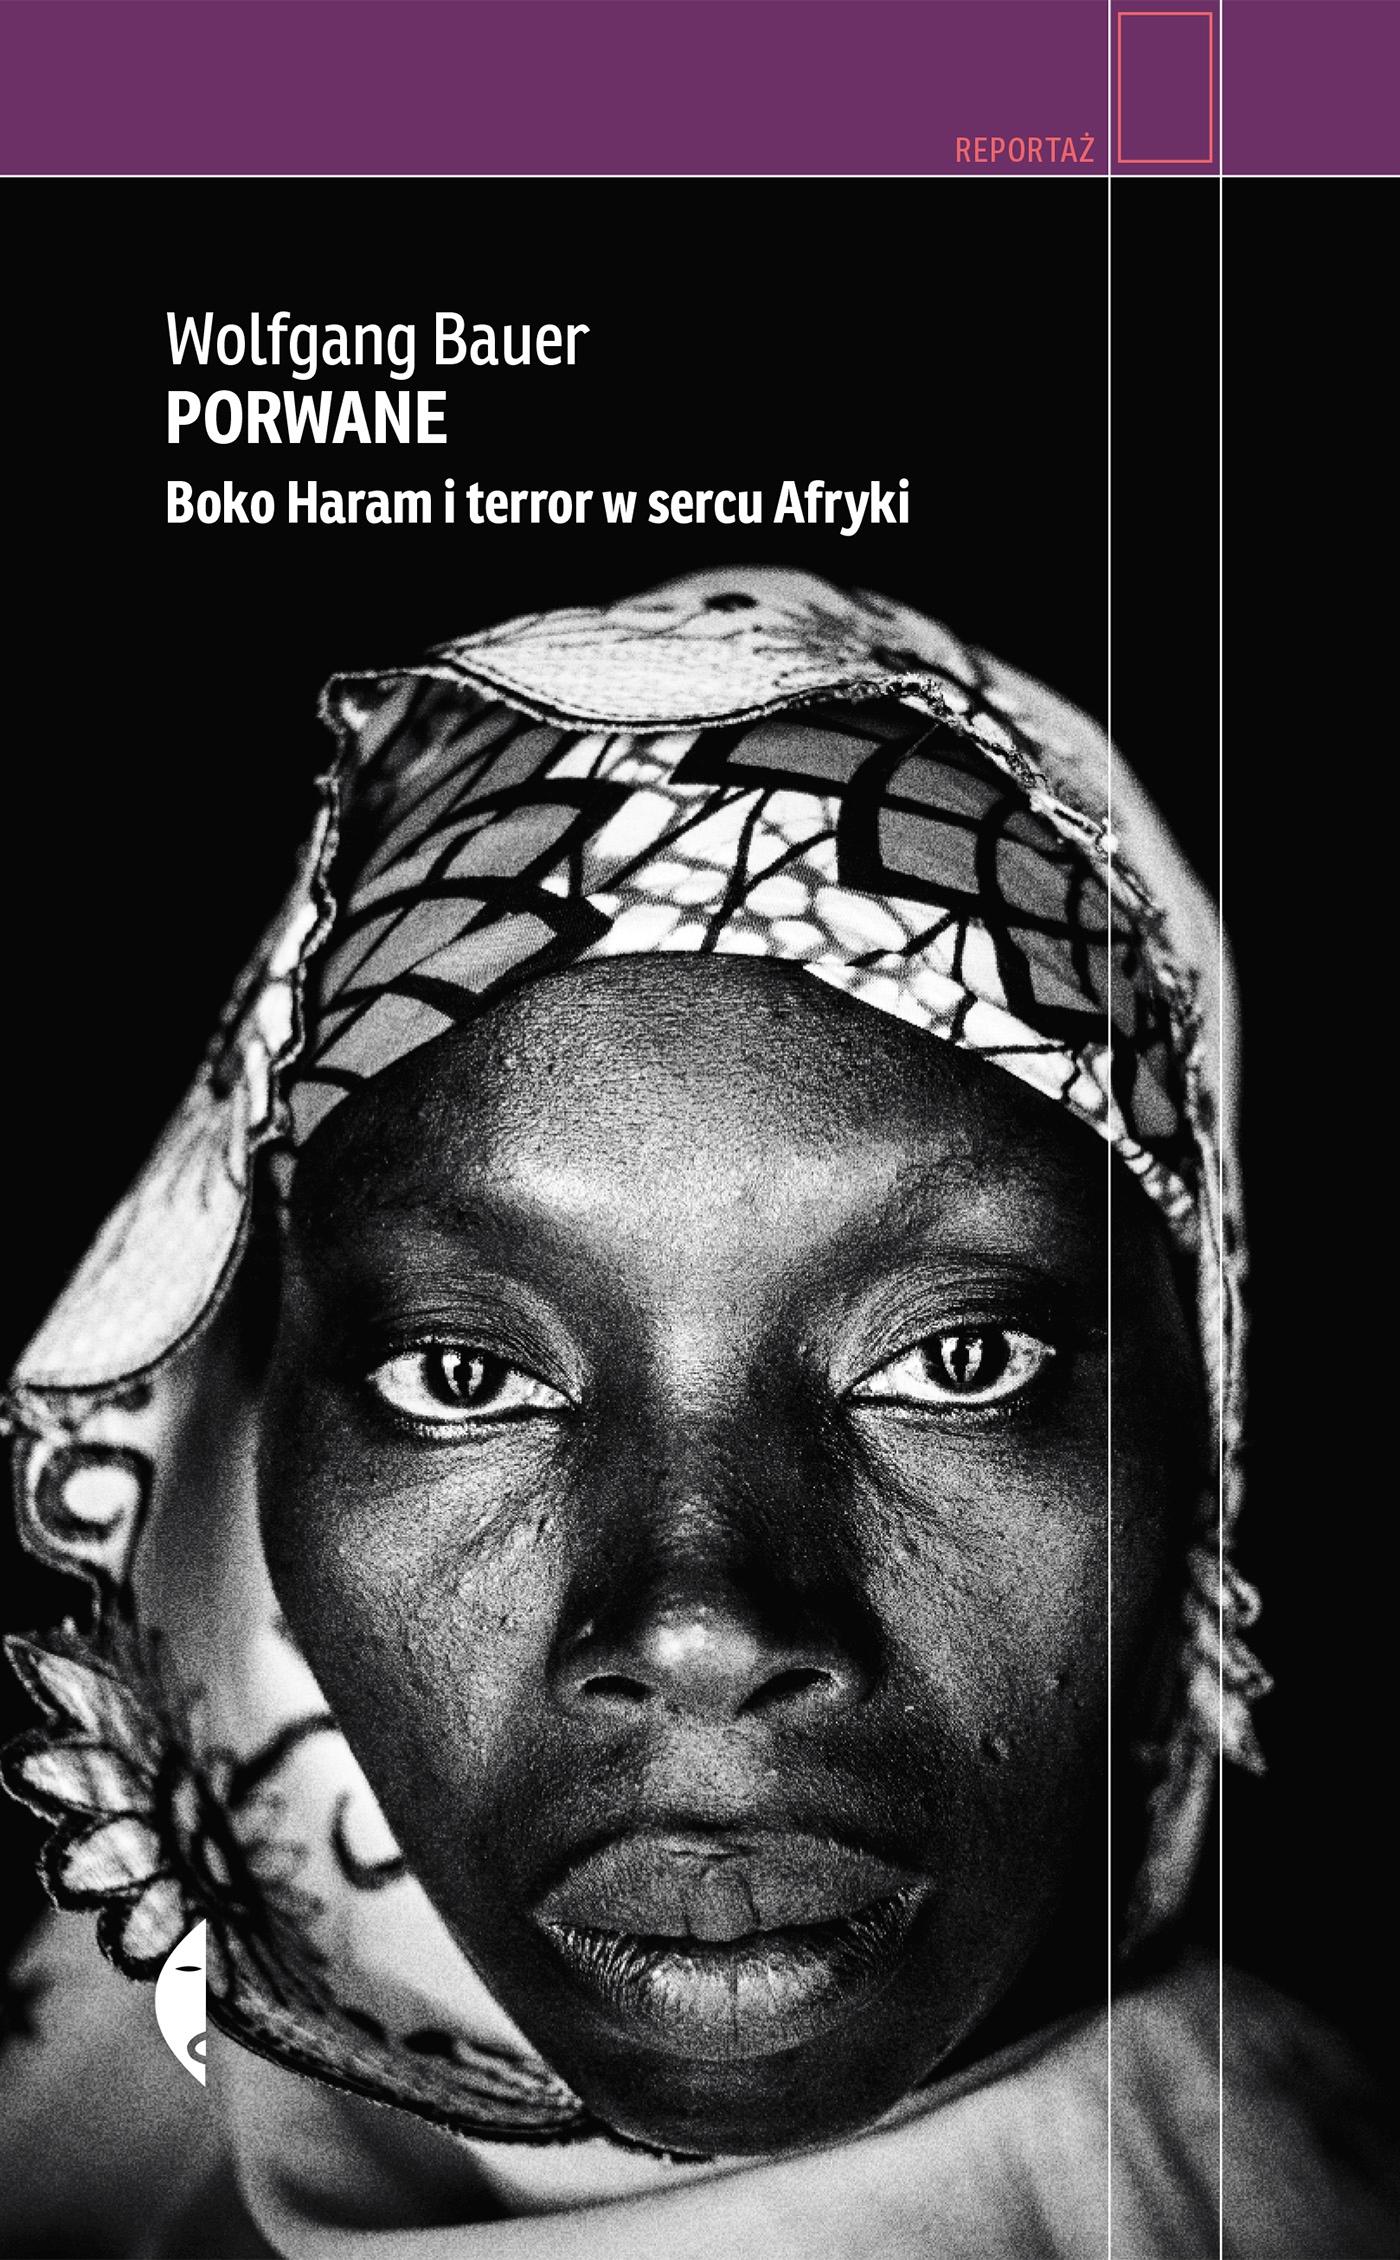 Wofgang Bauer, Porwane. Boko Haram i terror w sercu Afryki